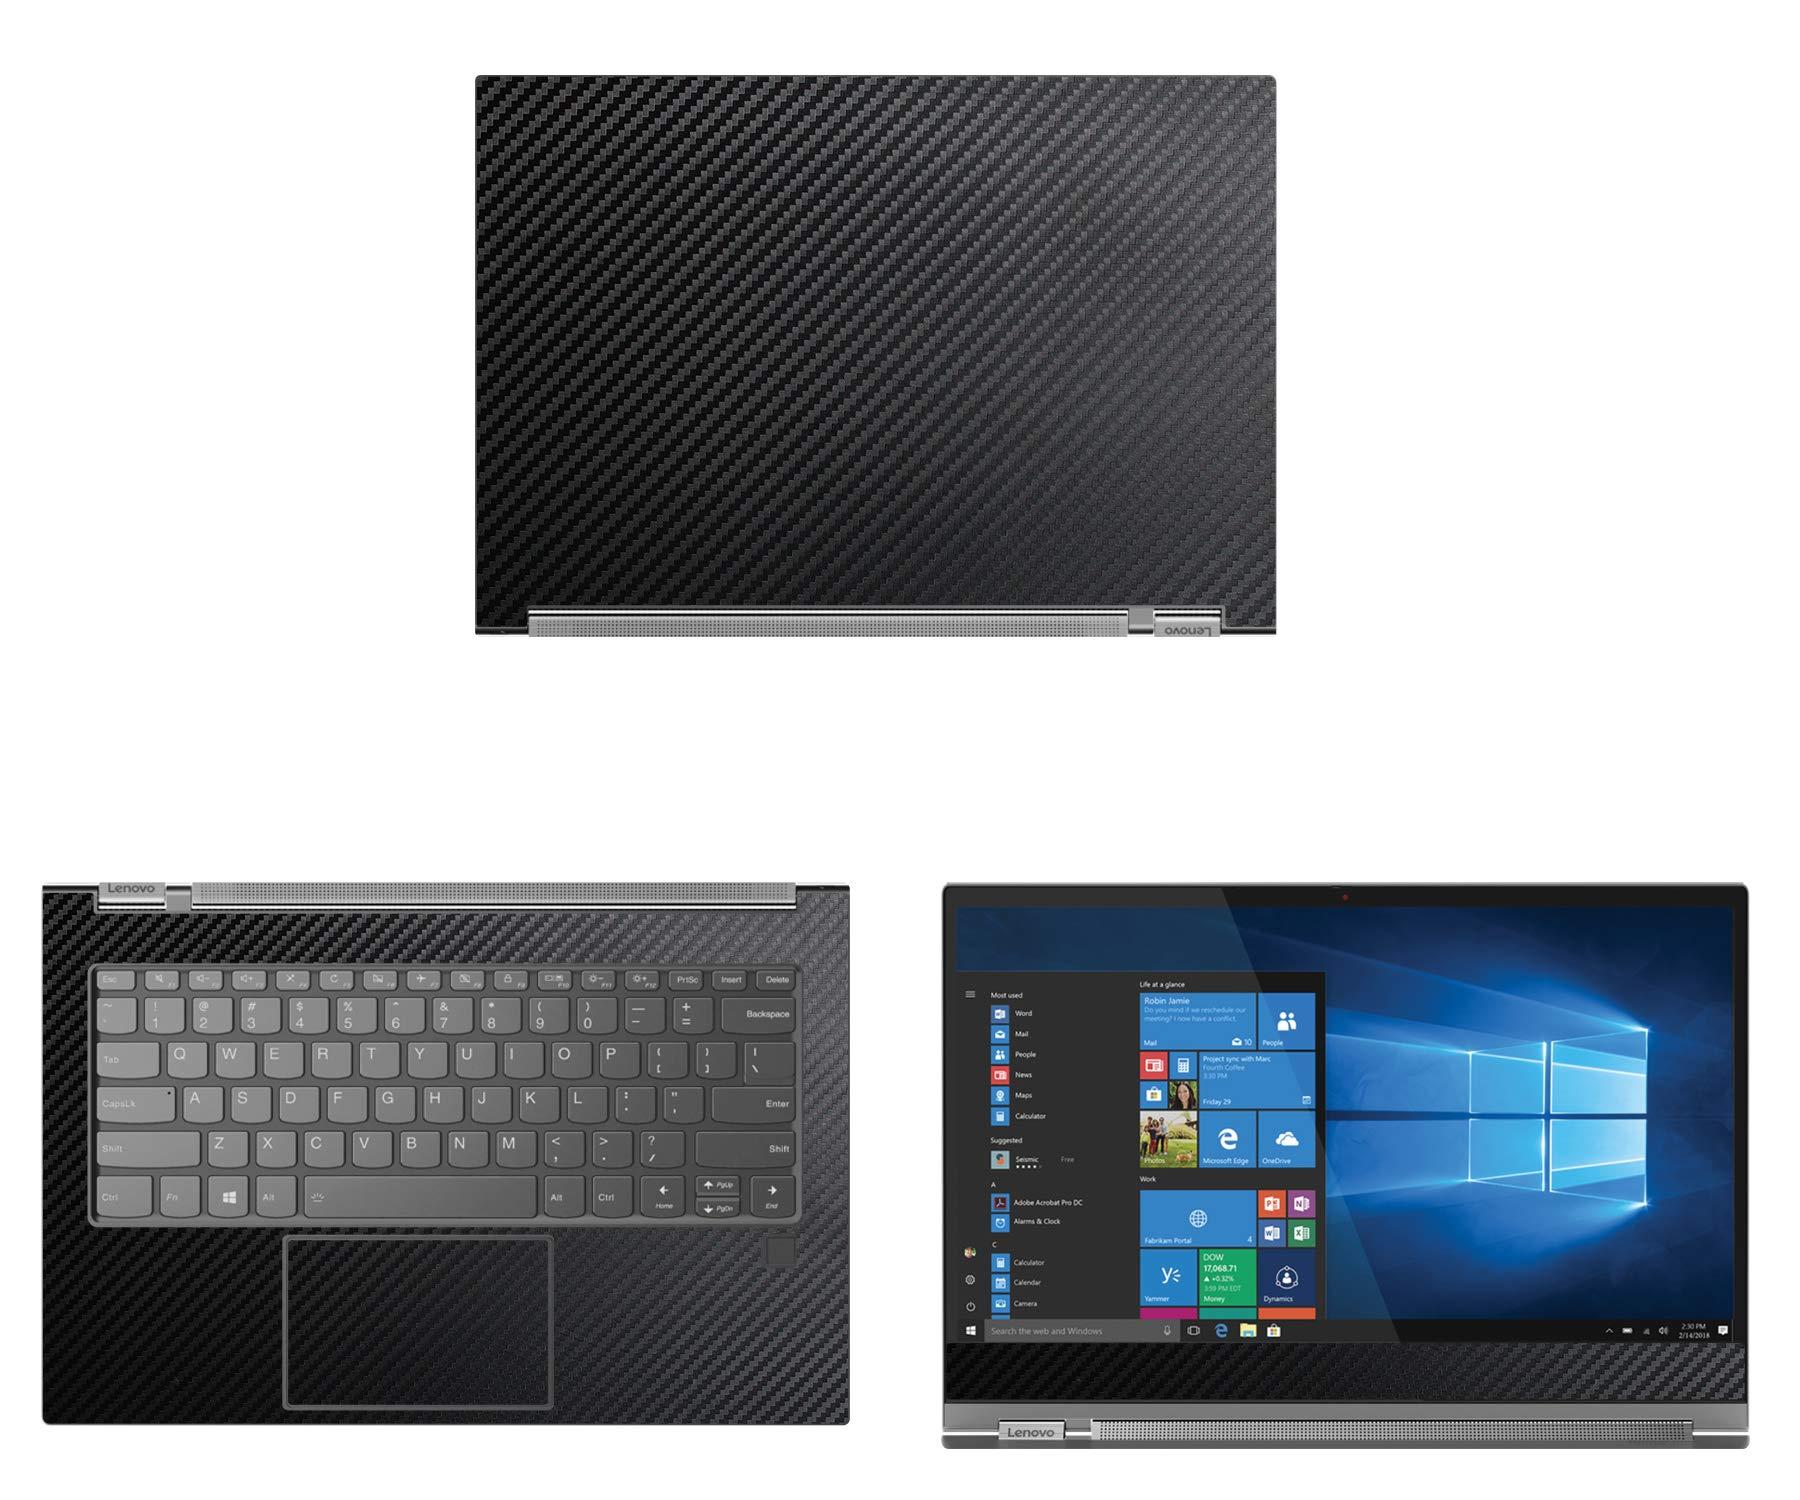 decalrus - Protective Decal for Lenovo Yoga C930 (13.9'' Screen) Laptop Black Carbon Fiber Skin Skins Decal wrap CFlenovoYoga13_C930Black